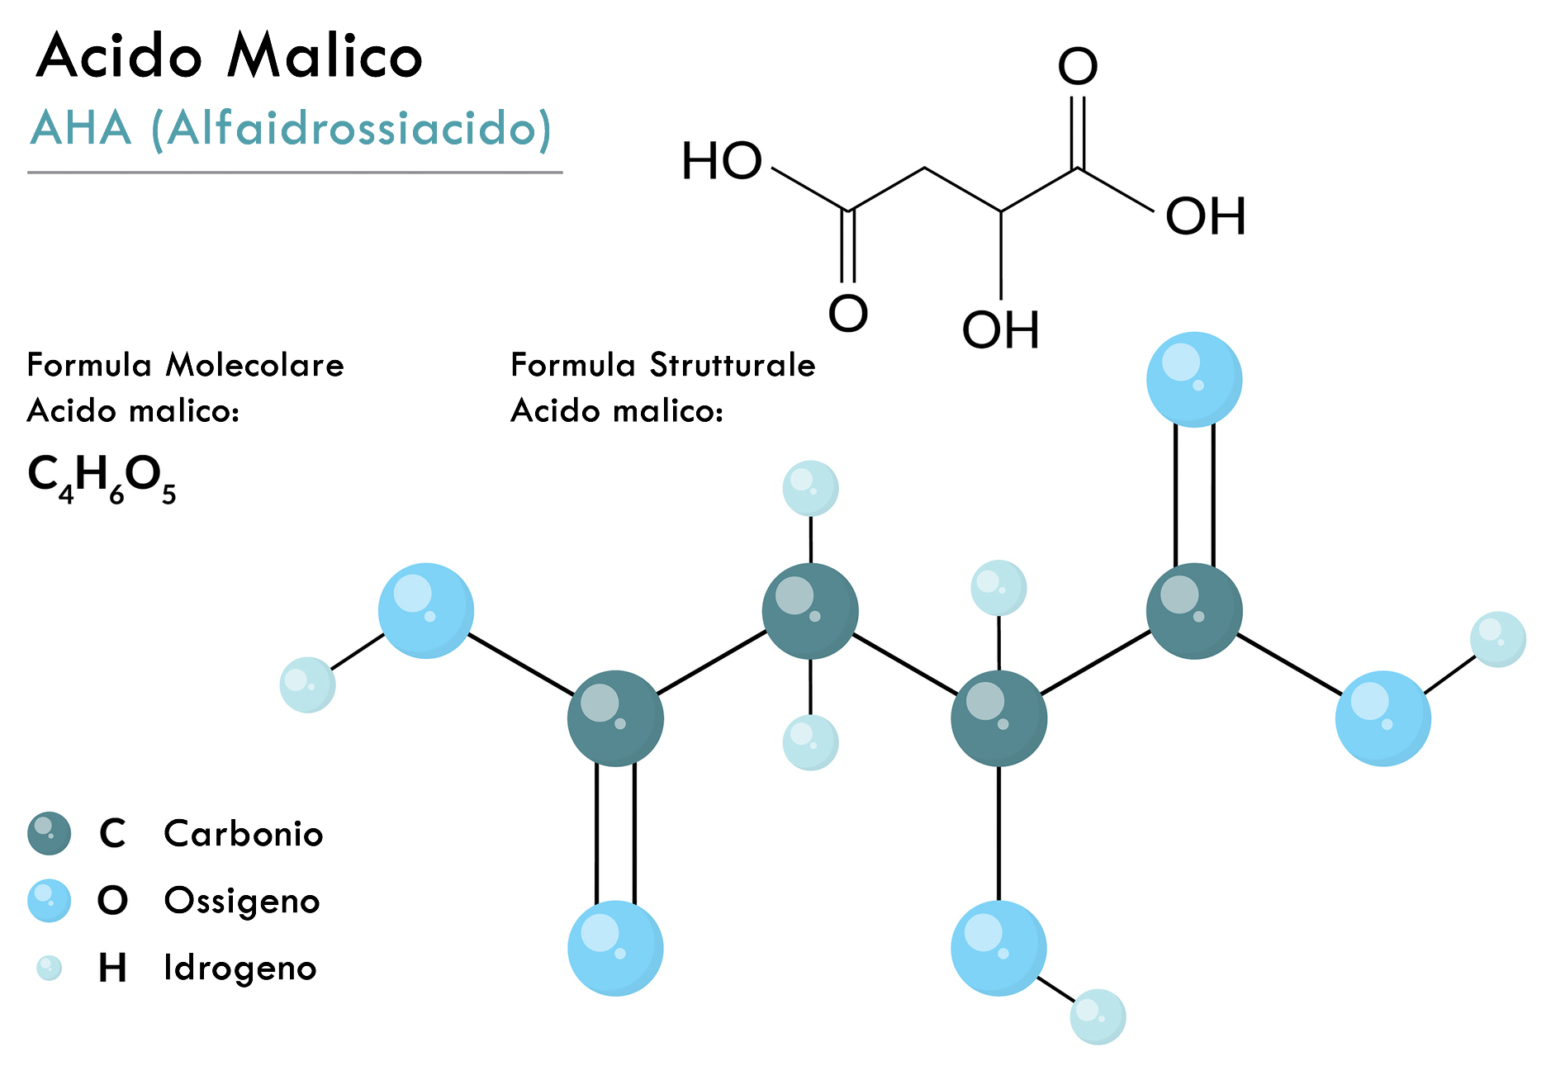 Acido Malico